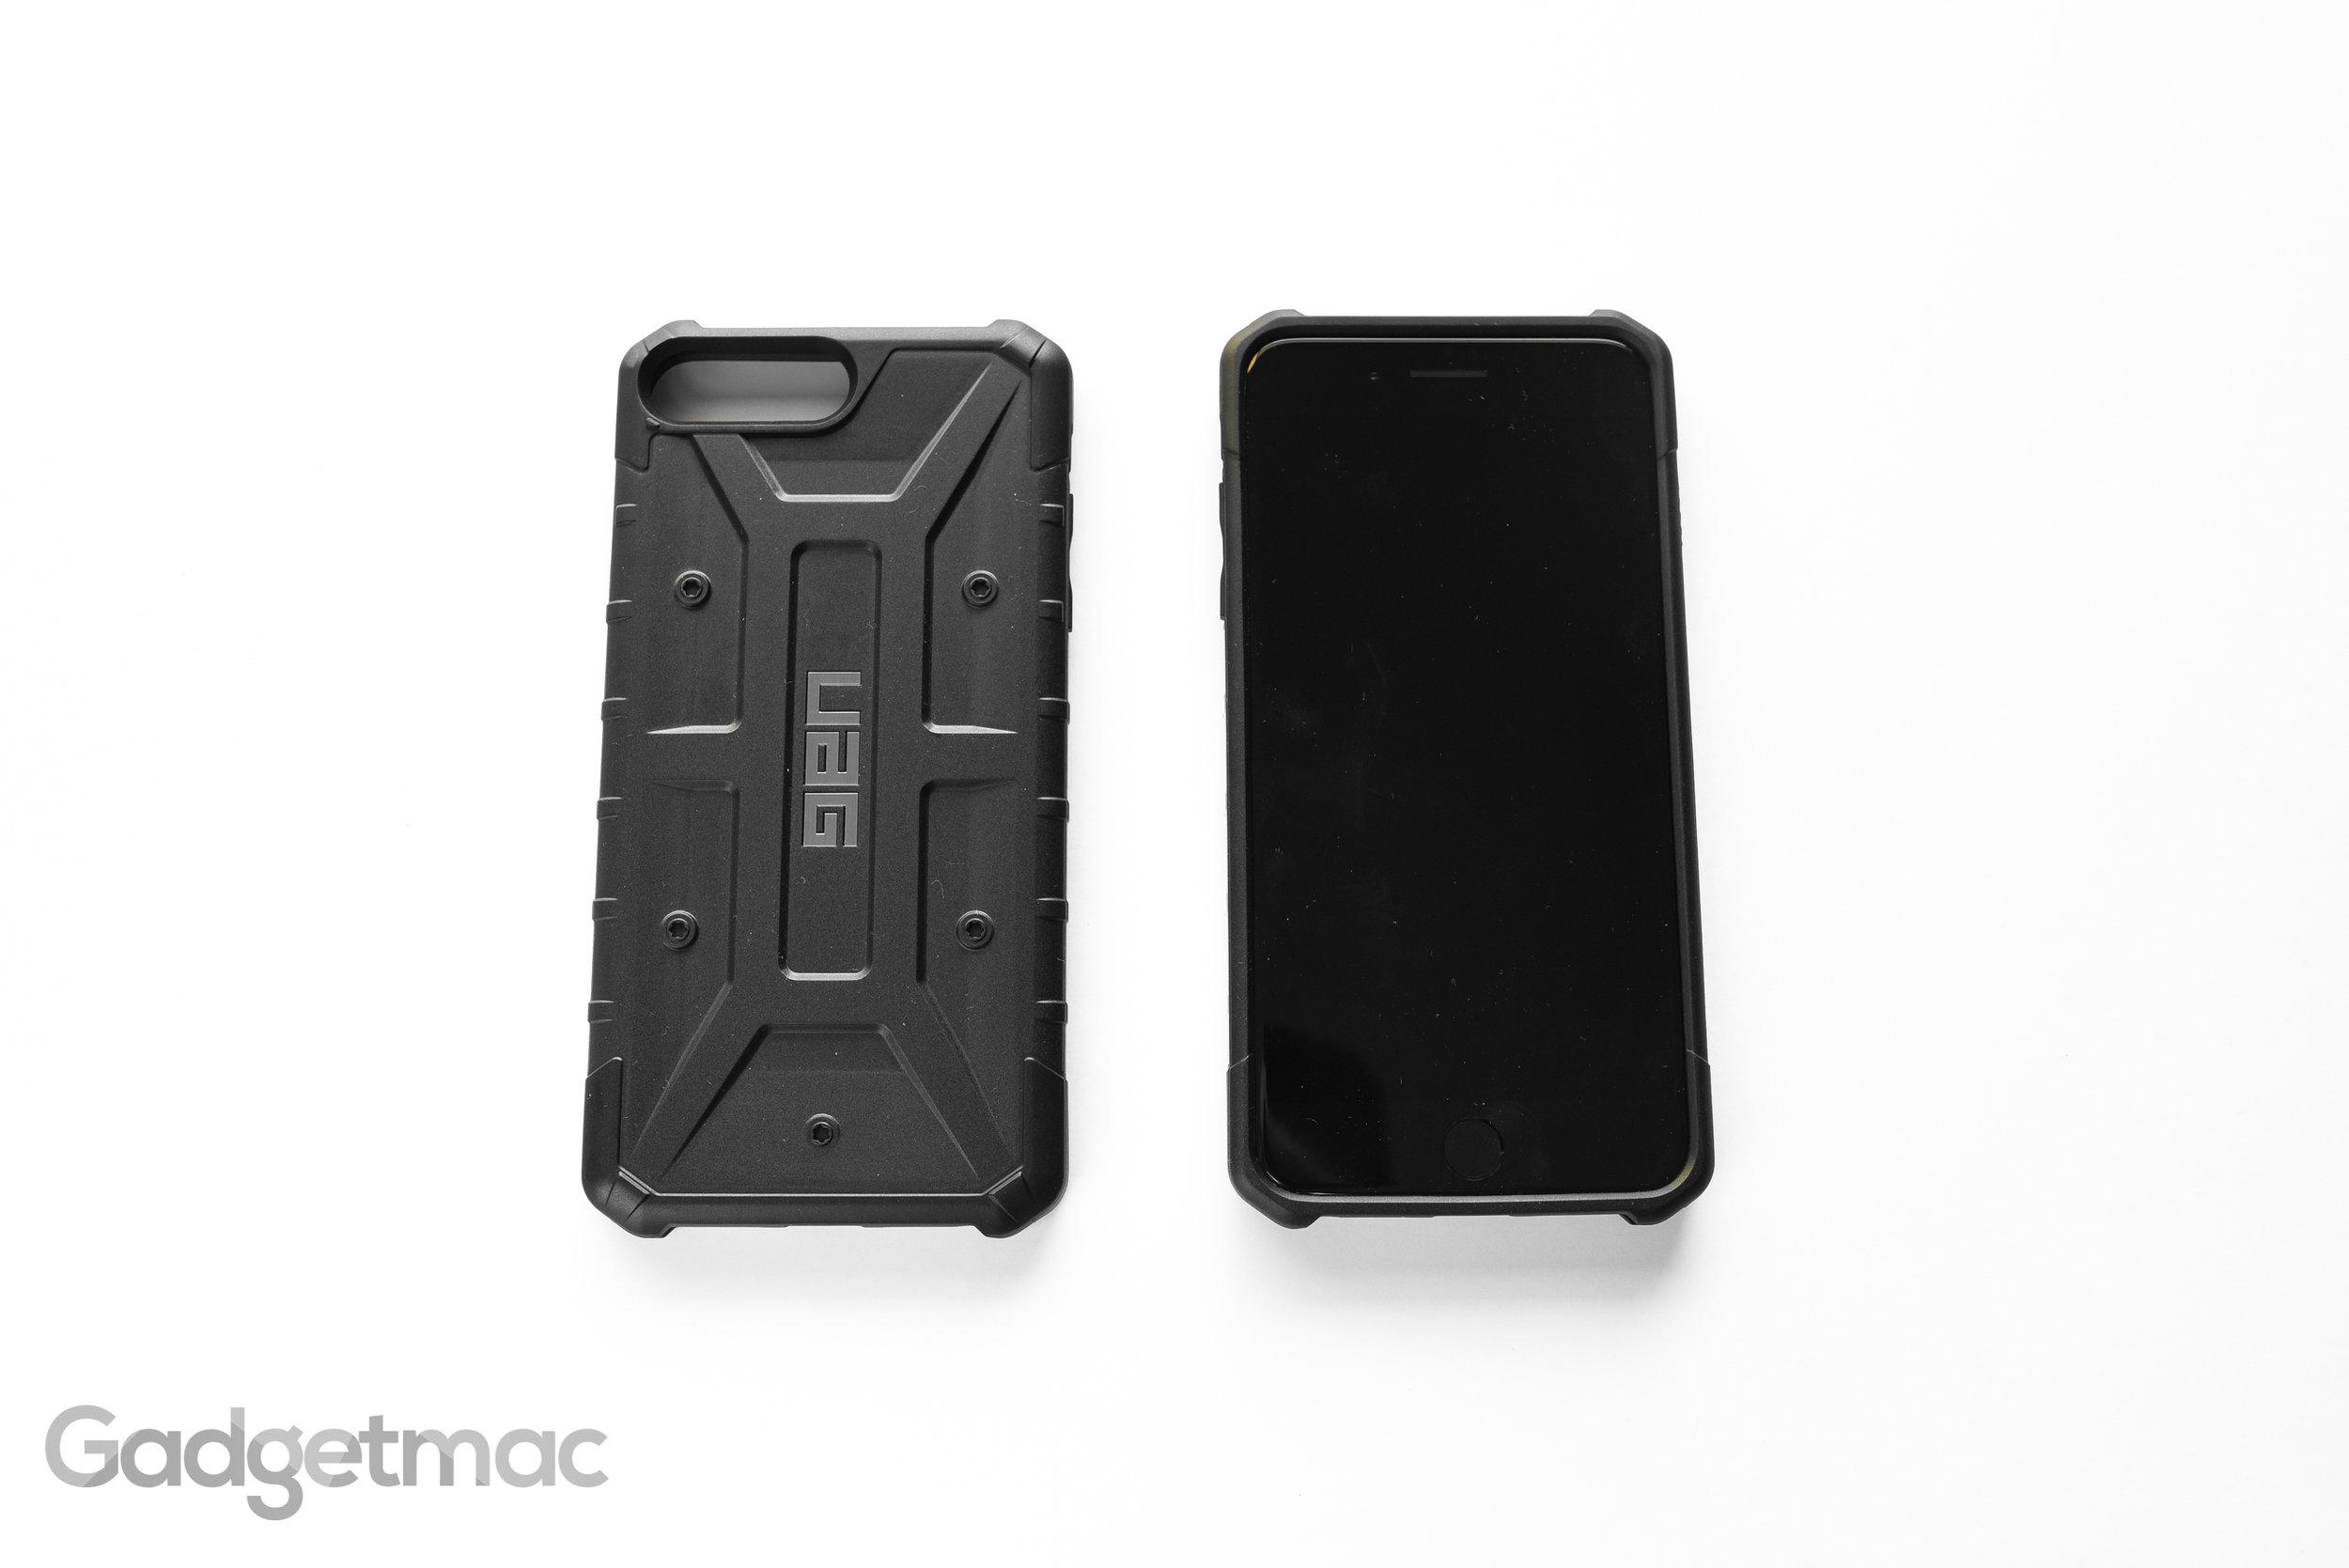 urban-armor-gear-iphone-7-plus-pathfinder-case-front.jpg